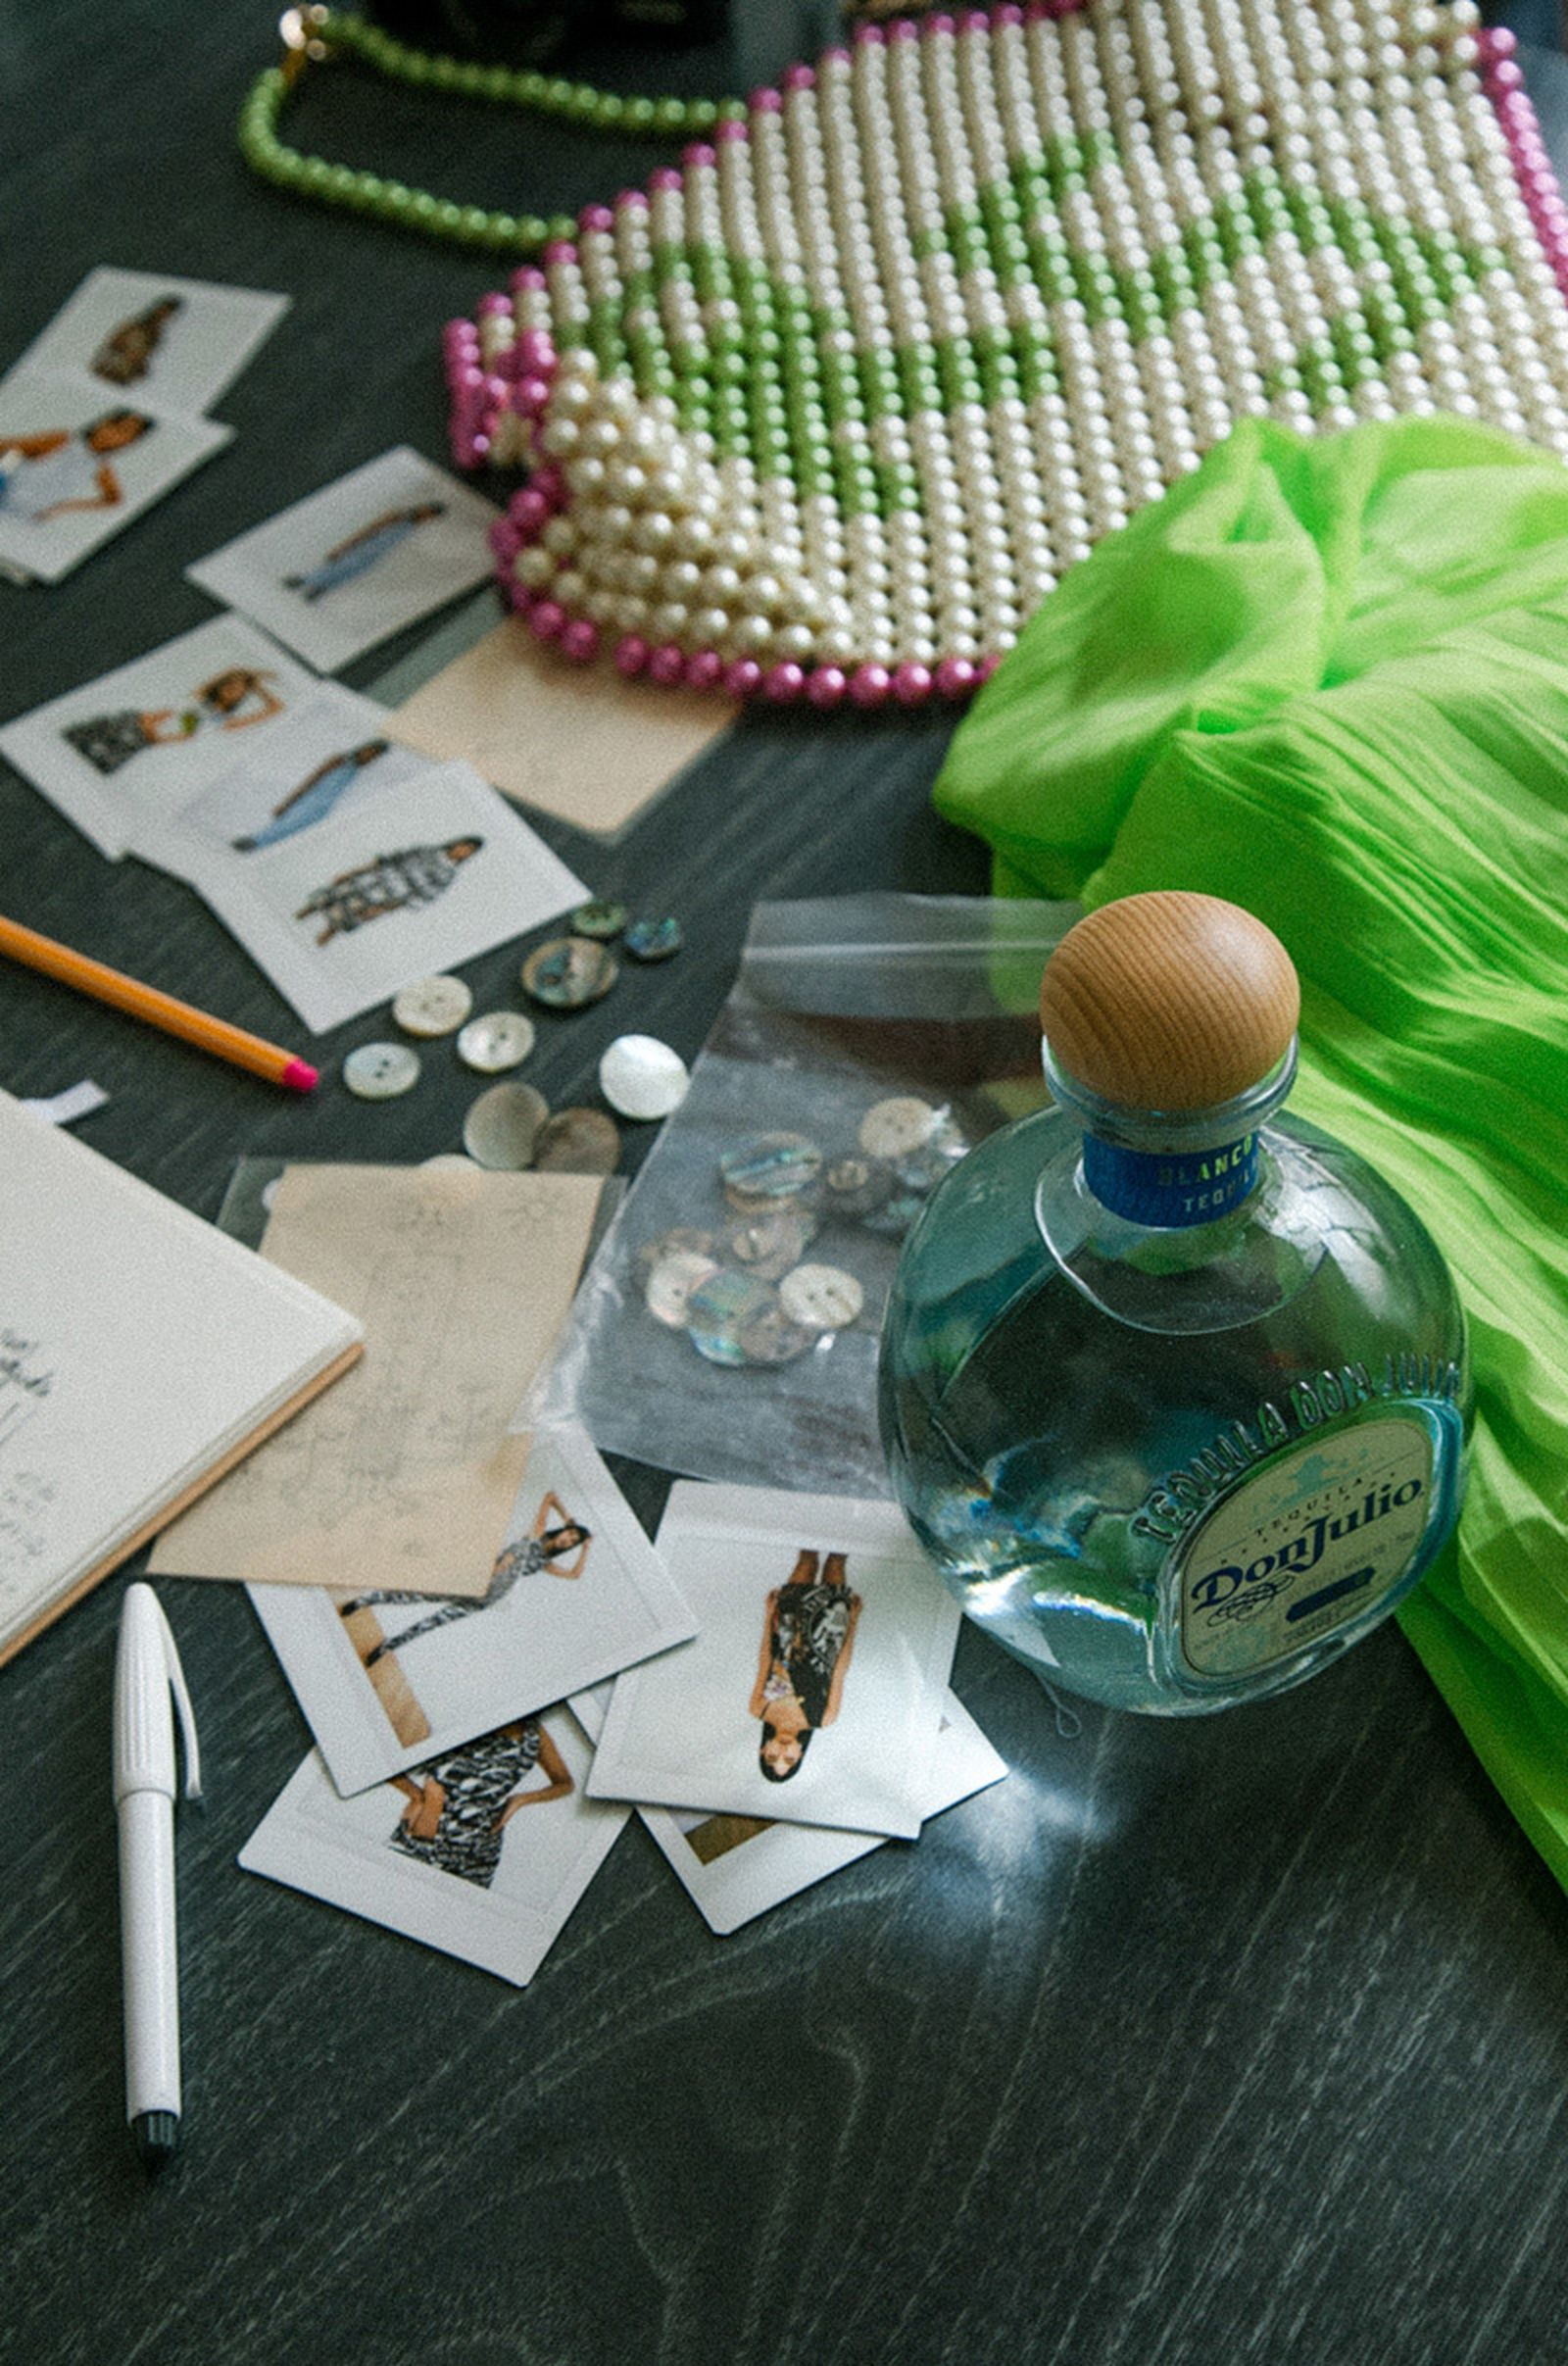 designer-roberto-sanchez-don-julio-tequila-09